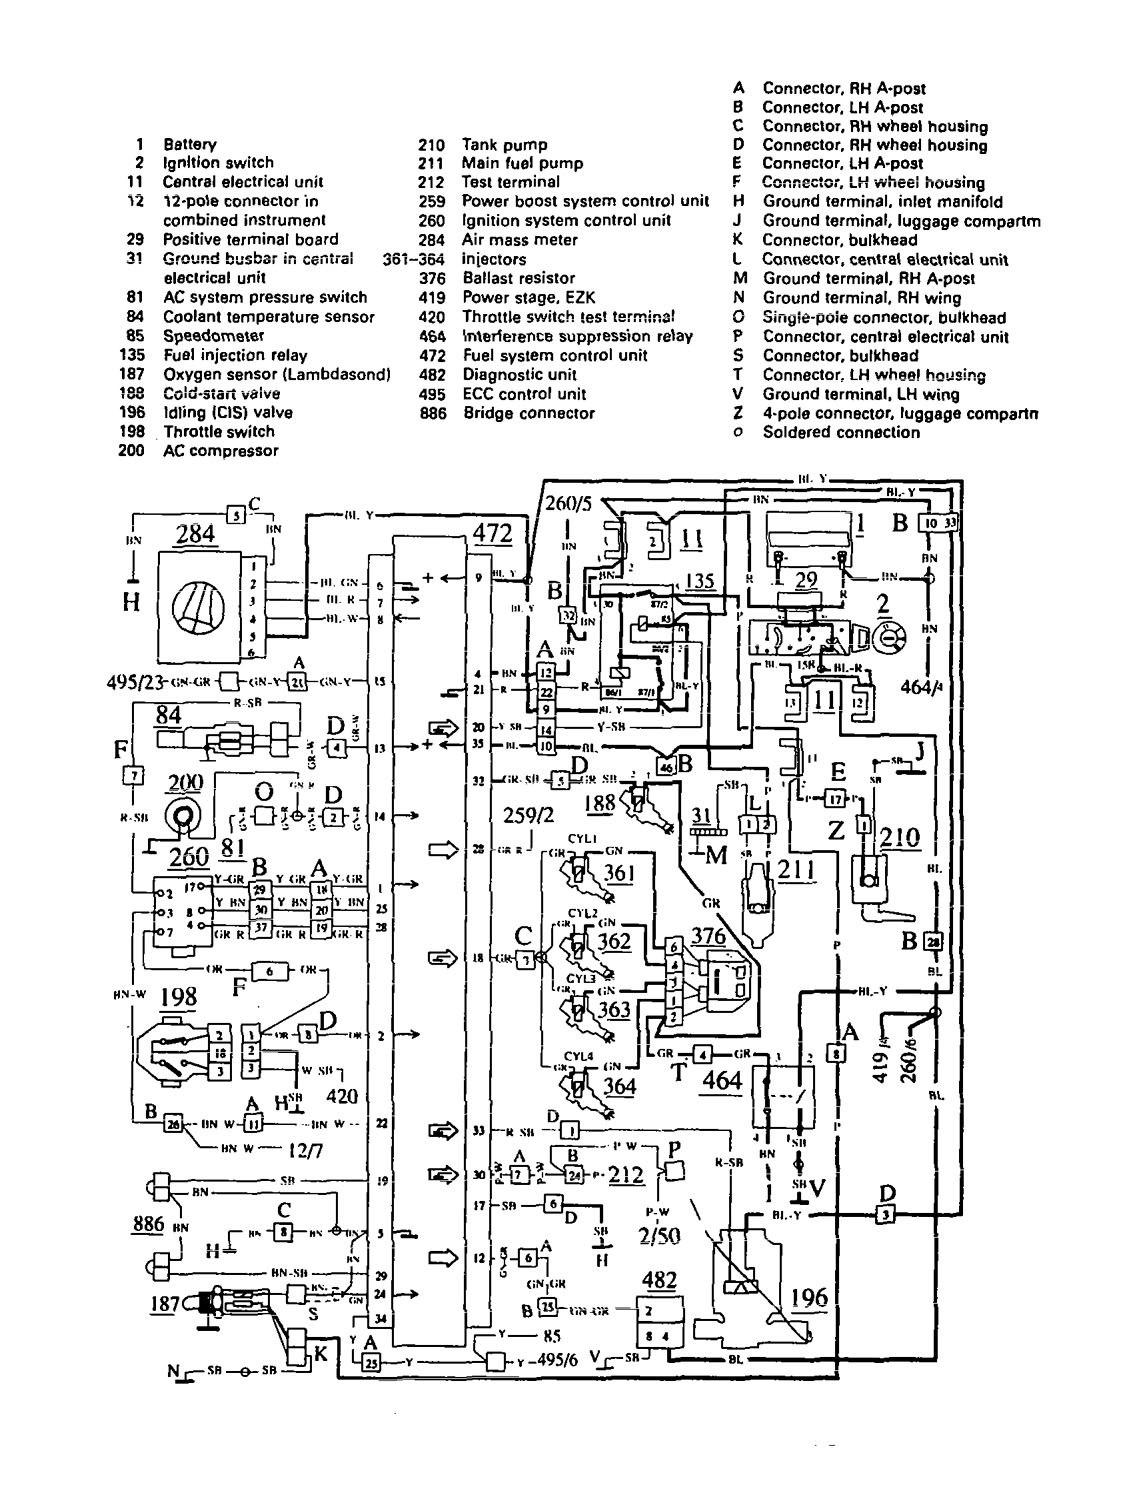 Volvo 780 (1991) - wiring diagrams - fuel control - CARKNOWLEDGE on volvo girls, volvo maintenance schedule, volvo brakes, volvo fuse box location, volvo relay diagram, volvo snowmobile, volvo yaw rate sensor, volvo s60 fuse diagram, volvo battery, volvo sport, volvo exhaust, volvo truck radio wiring harness, volvo recall information, volvo dashboard, volvo ignition, volvo xc90 fuse diagram, volvo 740 diagram, international truck electrical diagrams, volvo tools, volvo type r,